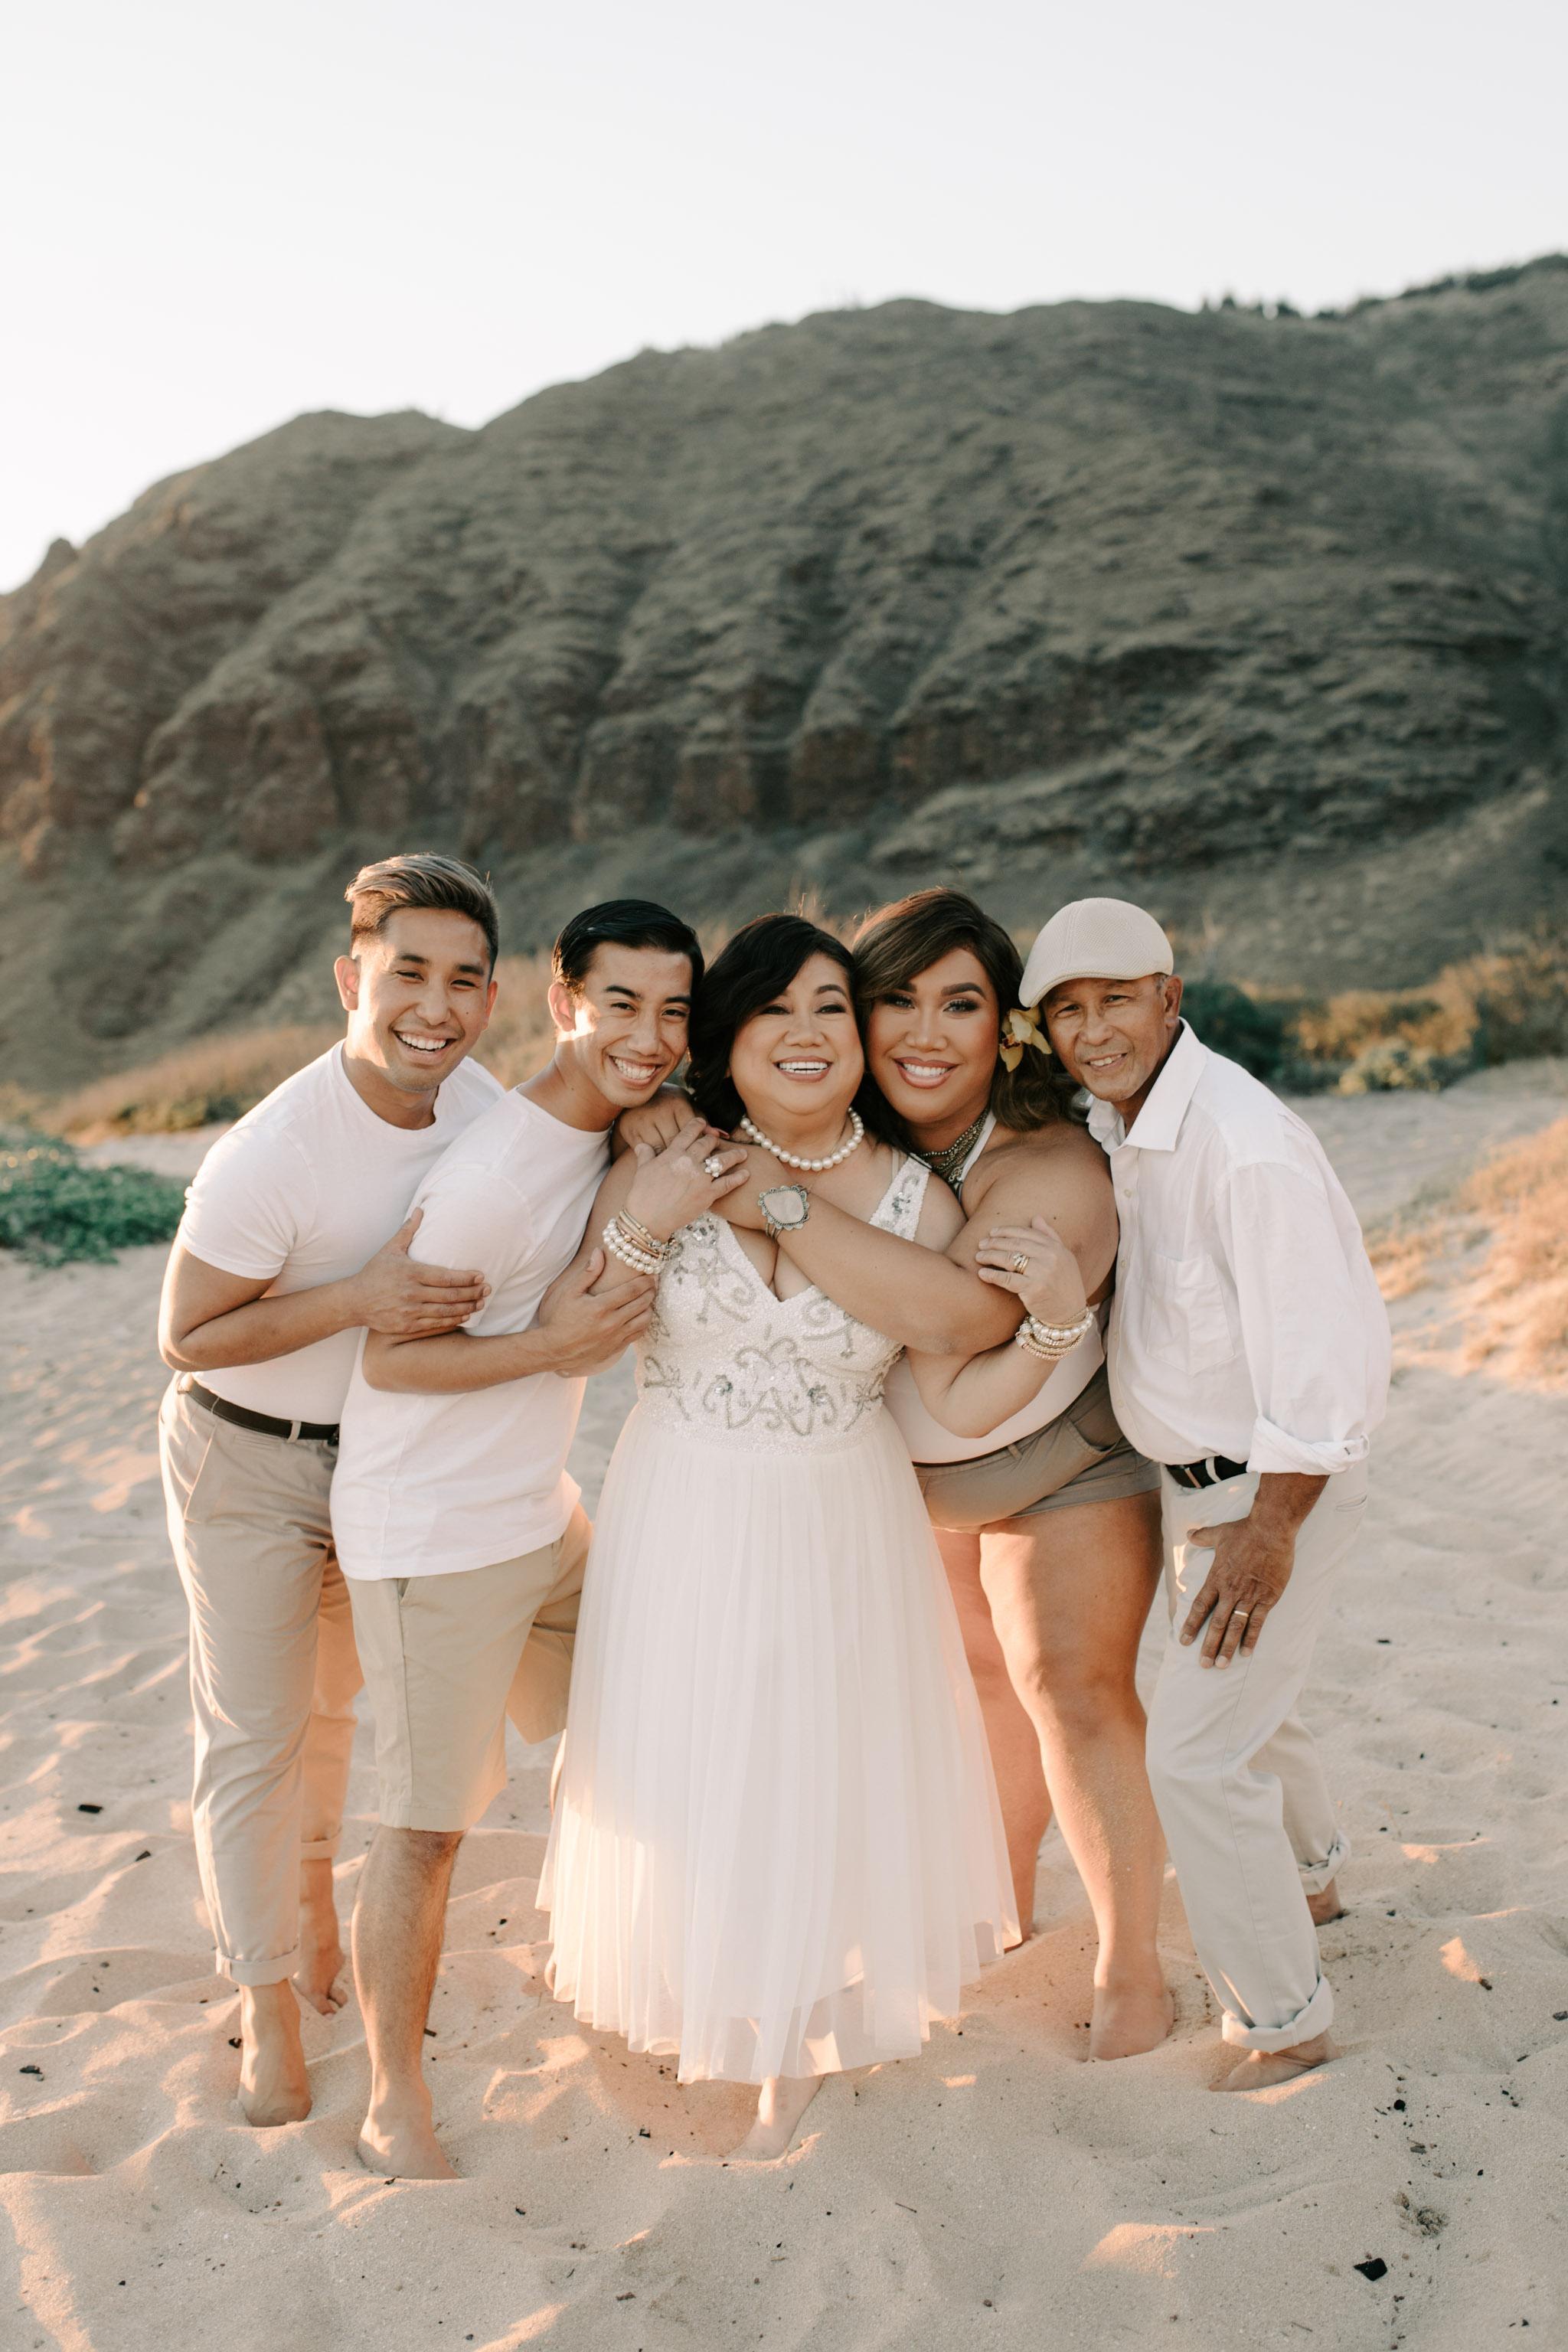 Patrick Starrr Hawaii Family Photos by Hawaii family photographer Desiree Leilani